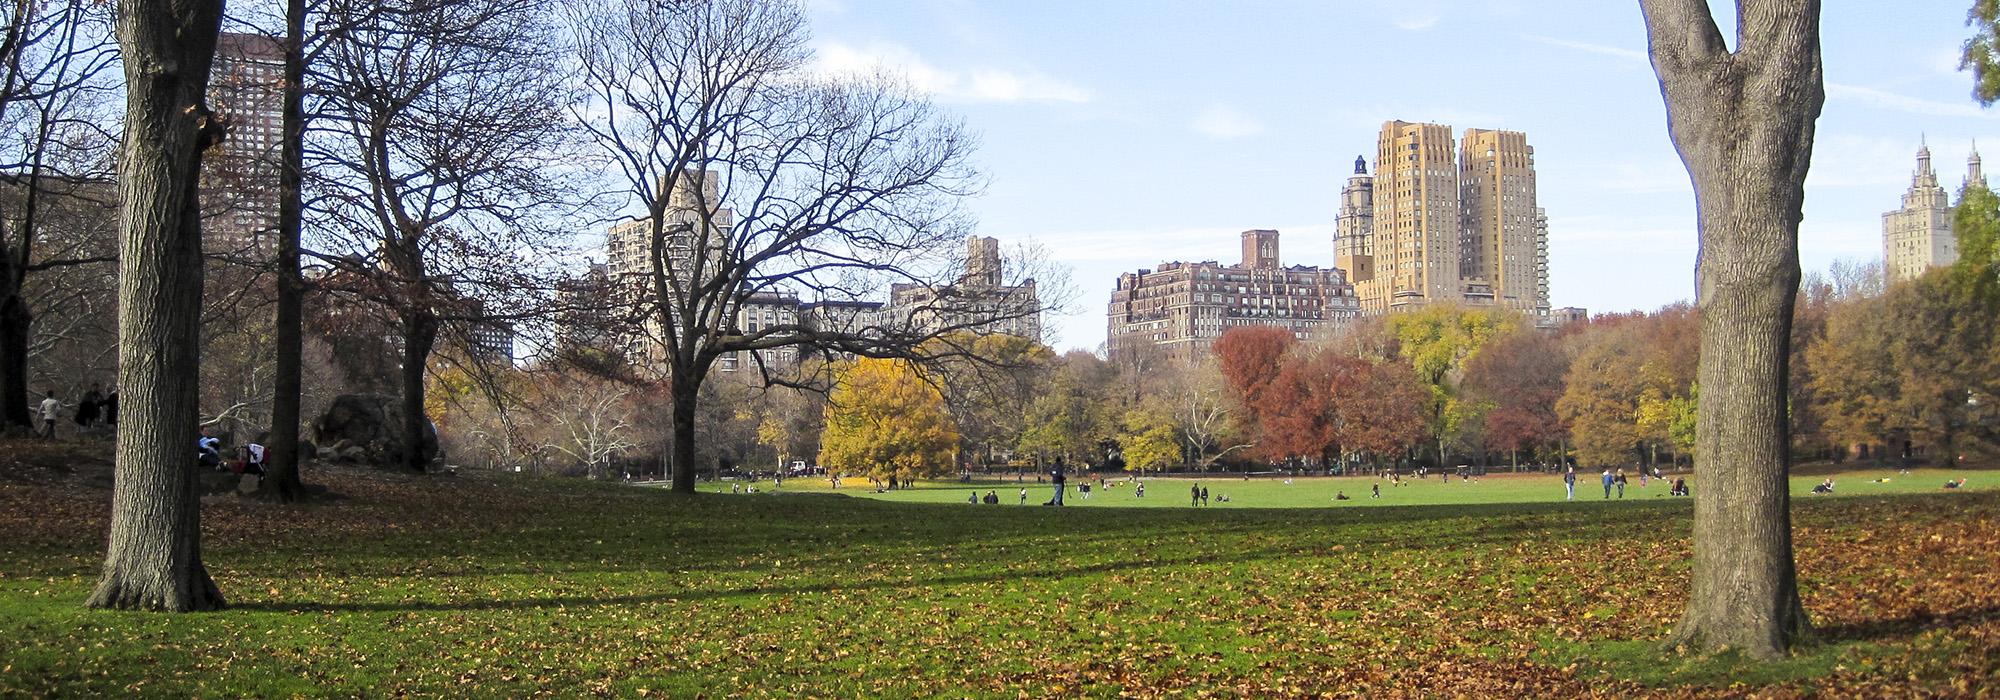 NYC_CentralPark_hero_CharlesBirnbaum_2009_02.jpg